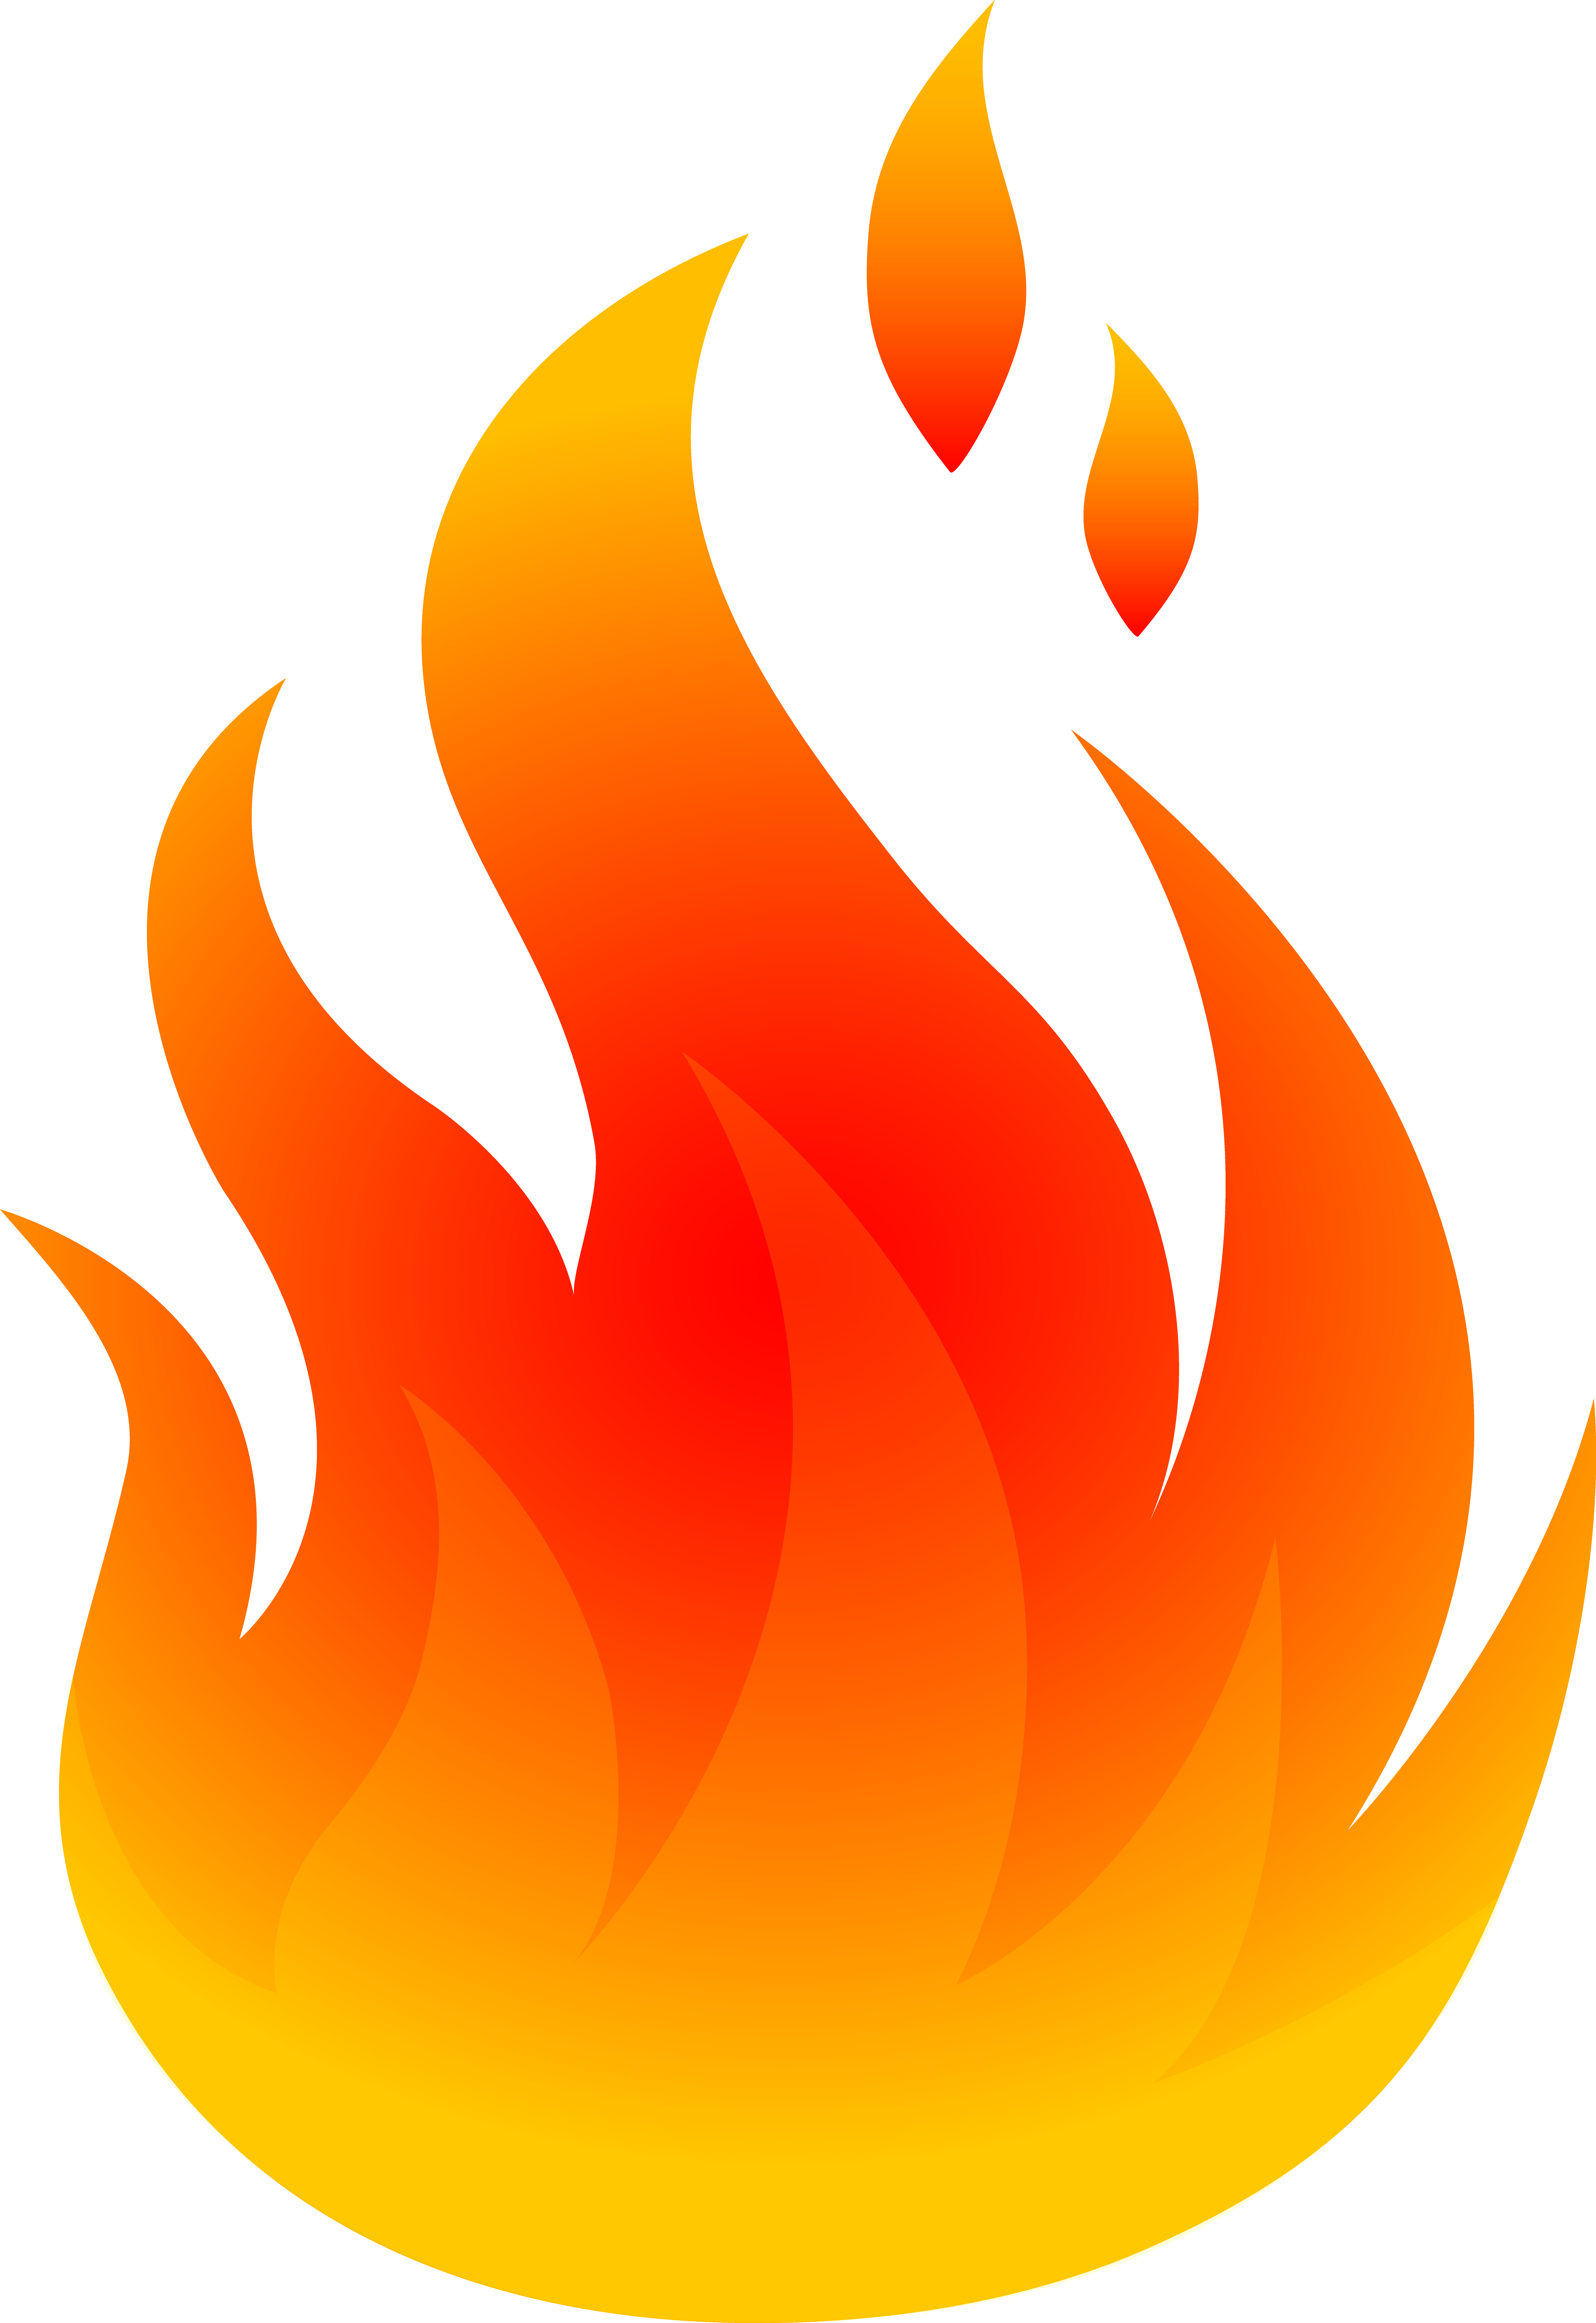 Simple flame clipart vector transparent download Flame clipart simple, Flame simple Transparent FREE for ... vector transparent download